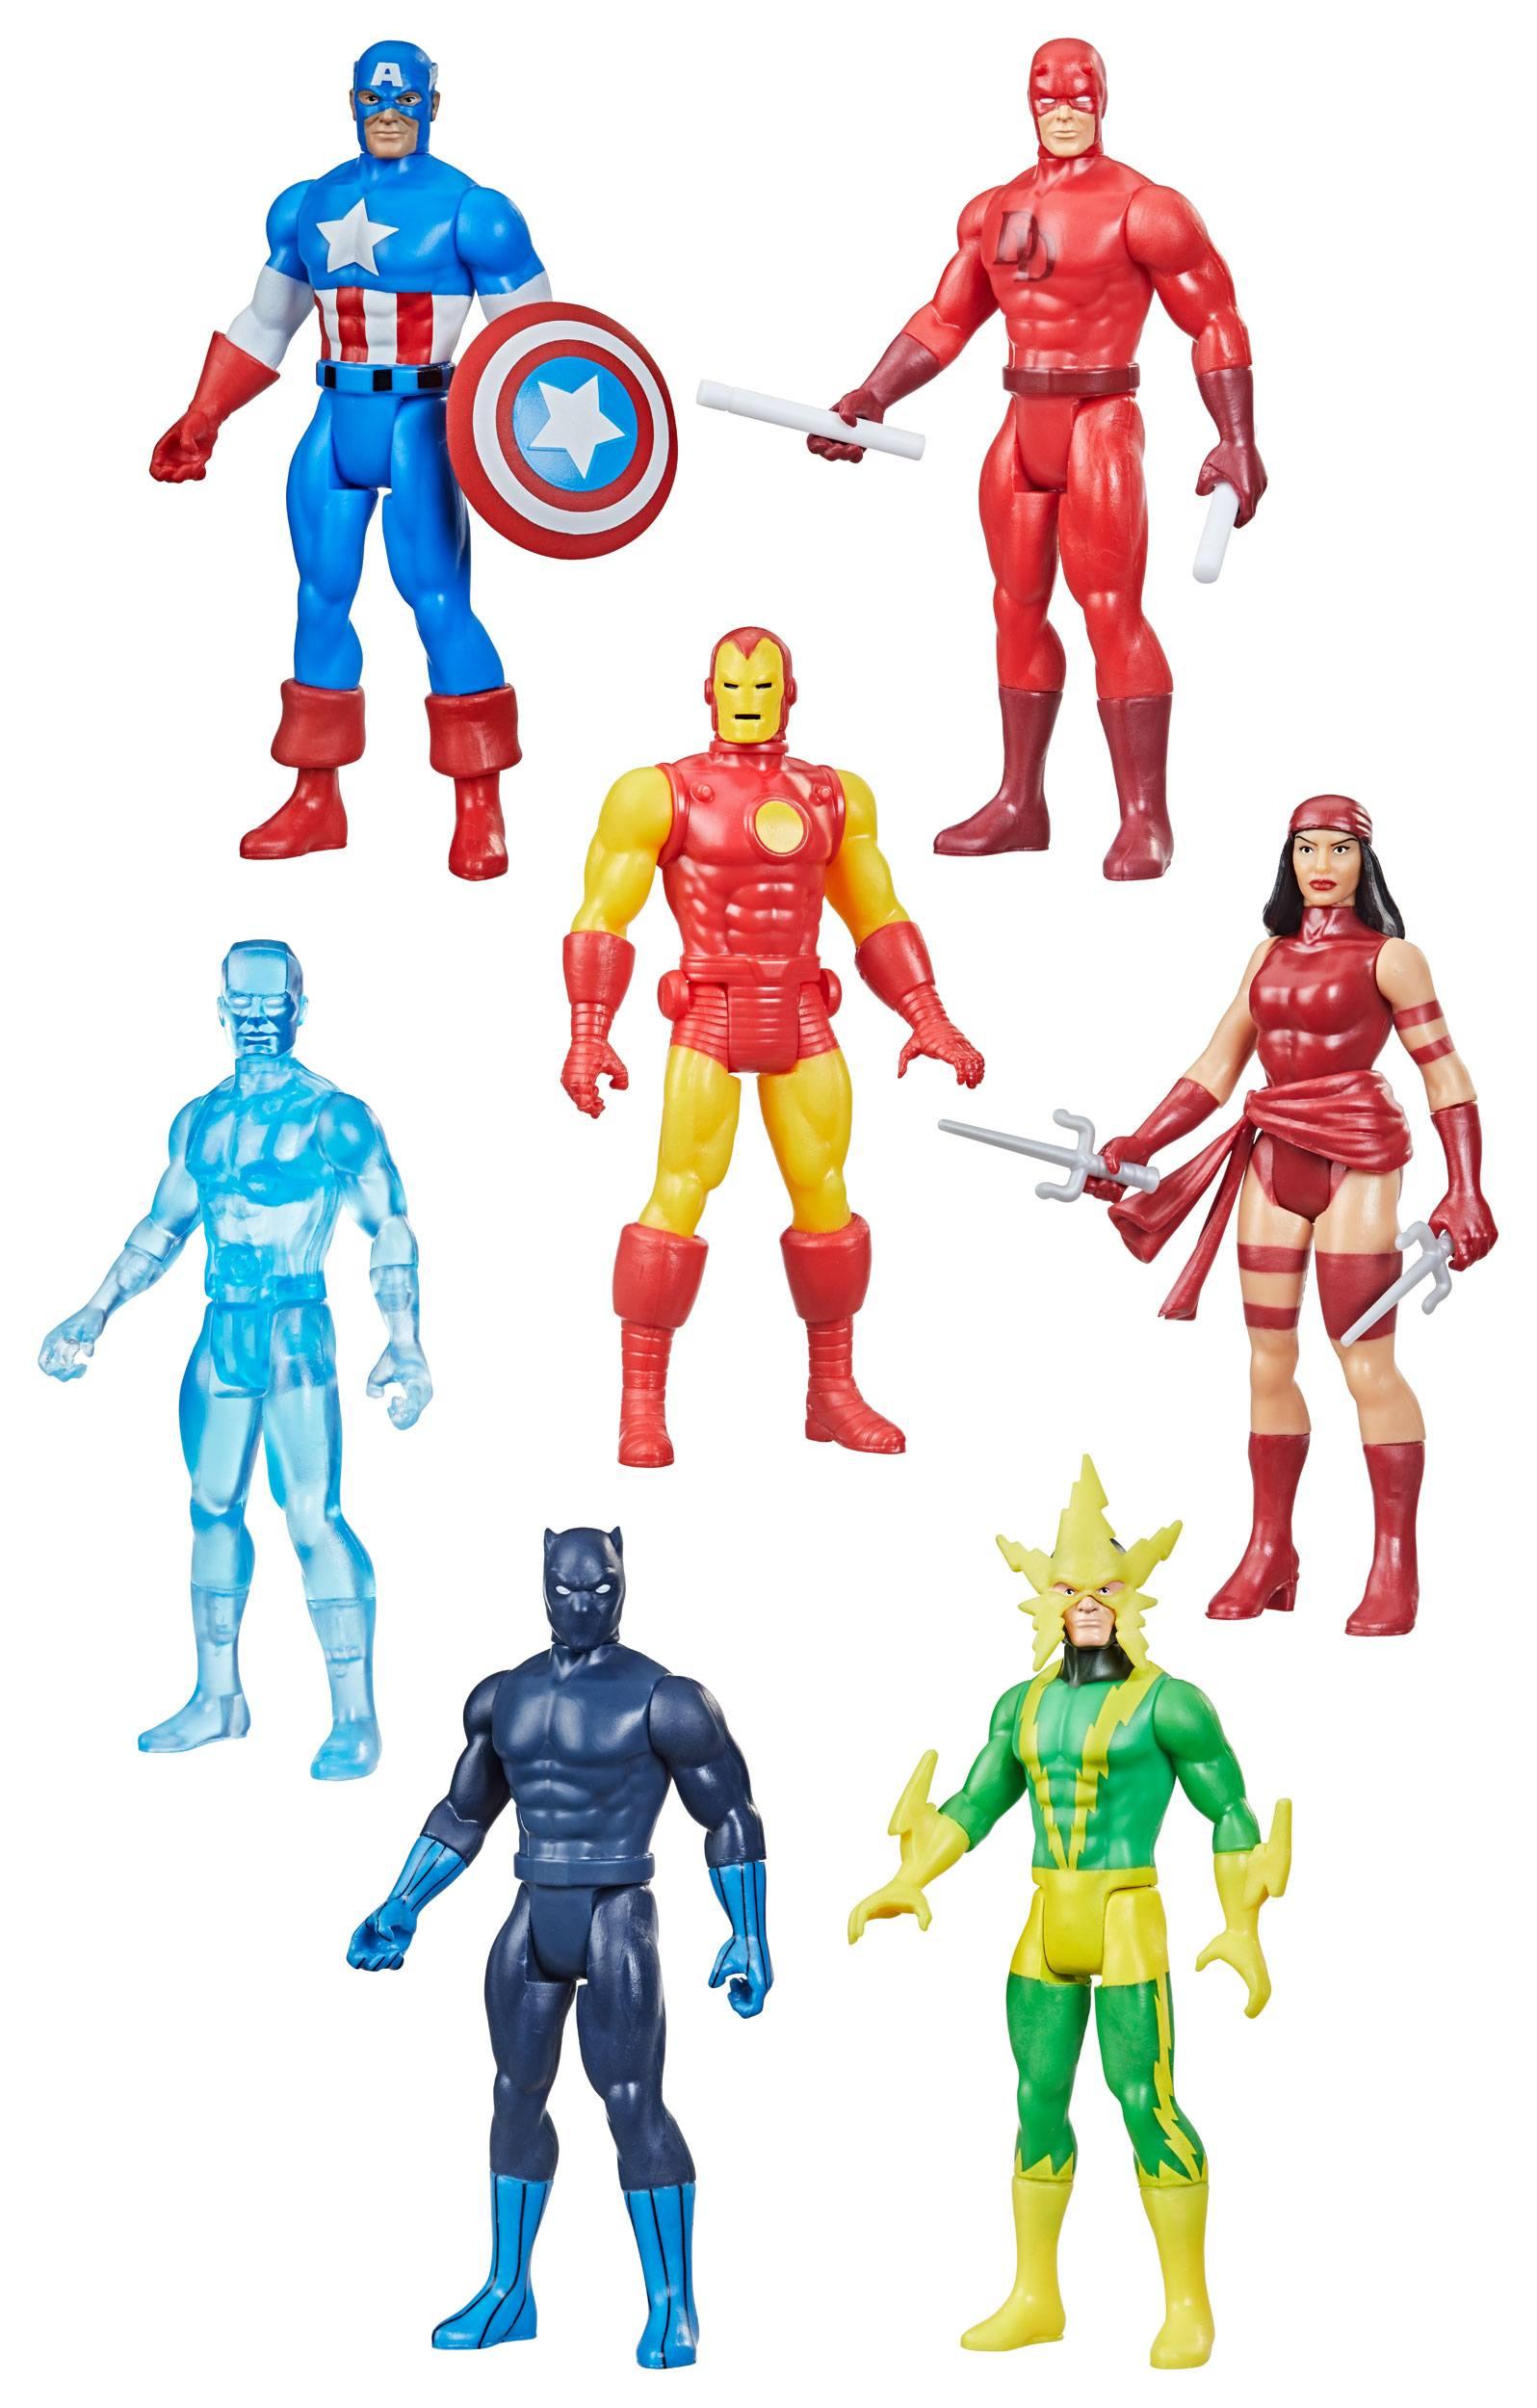 Hasbro Marvel Legends 3.75-inch Retro 375 Collection Assortment (7) Wave 2 F26485L01 5010993842766